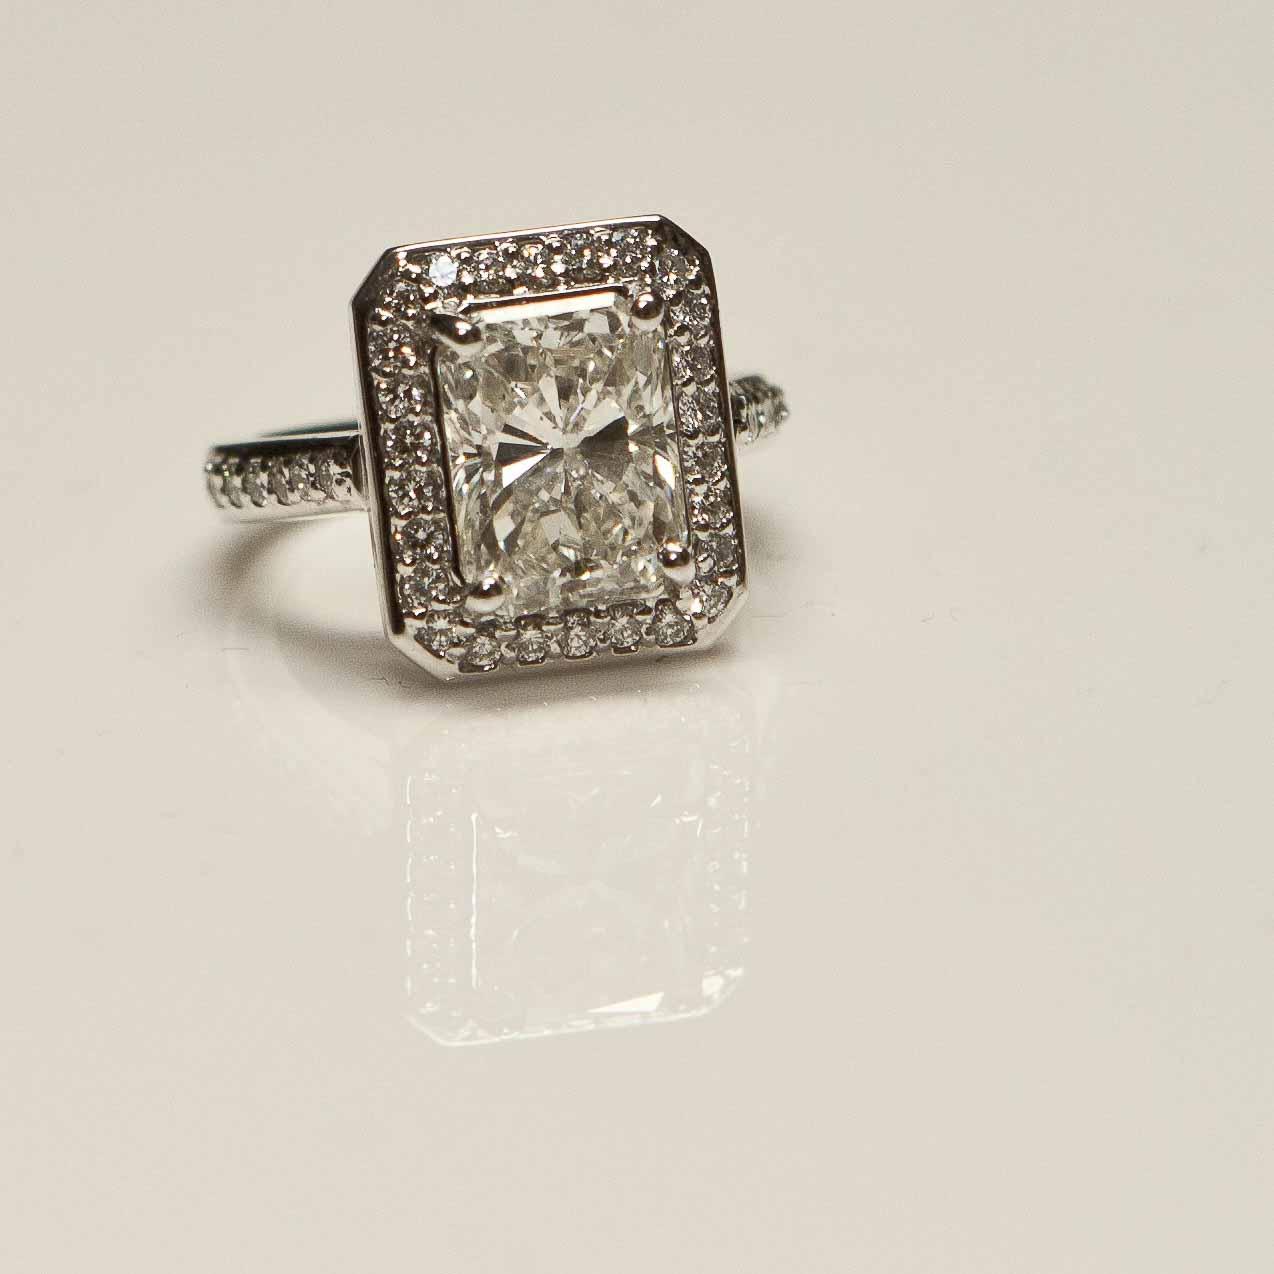 2011 02 RS Durant Jewelry February 2011-5444.jpg